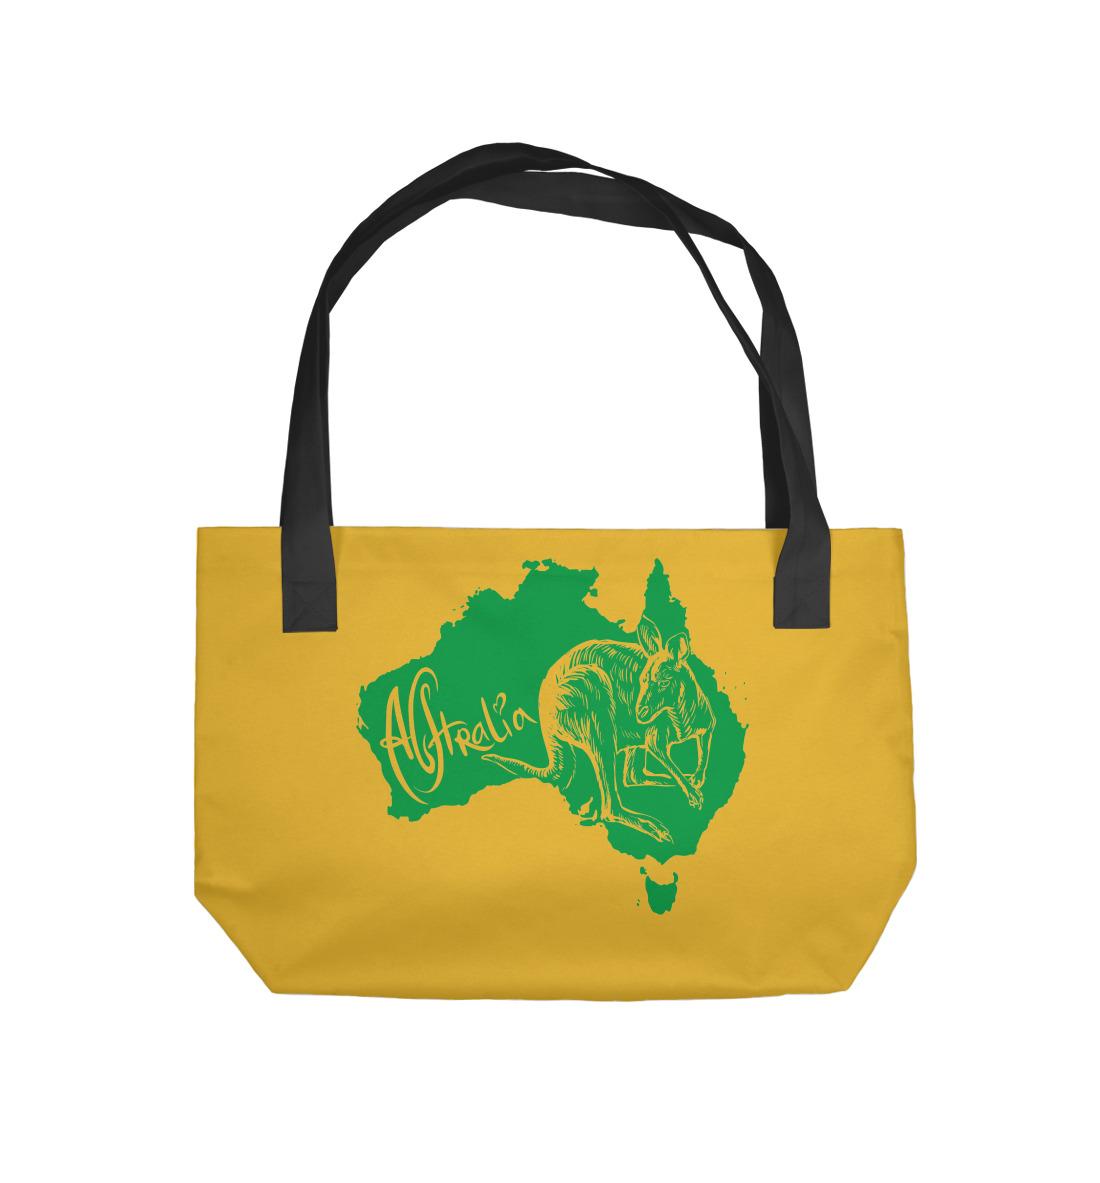 рюкзаки кенгуру Австралия кенгуру